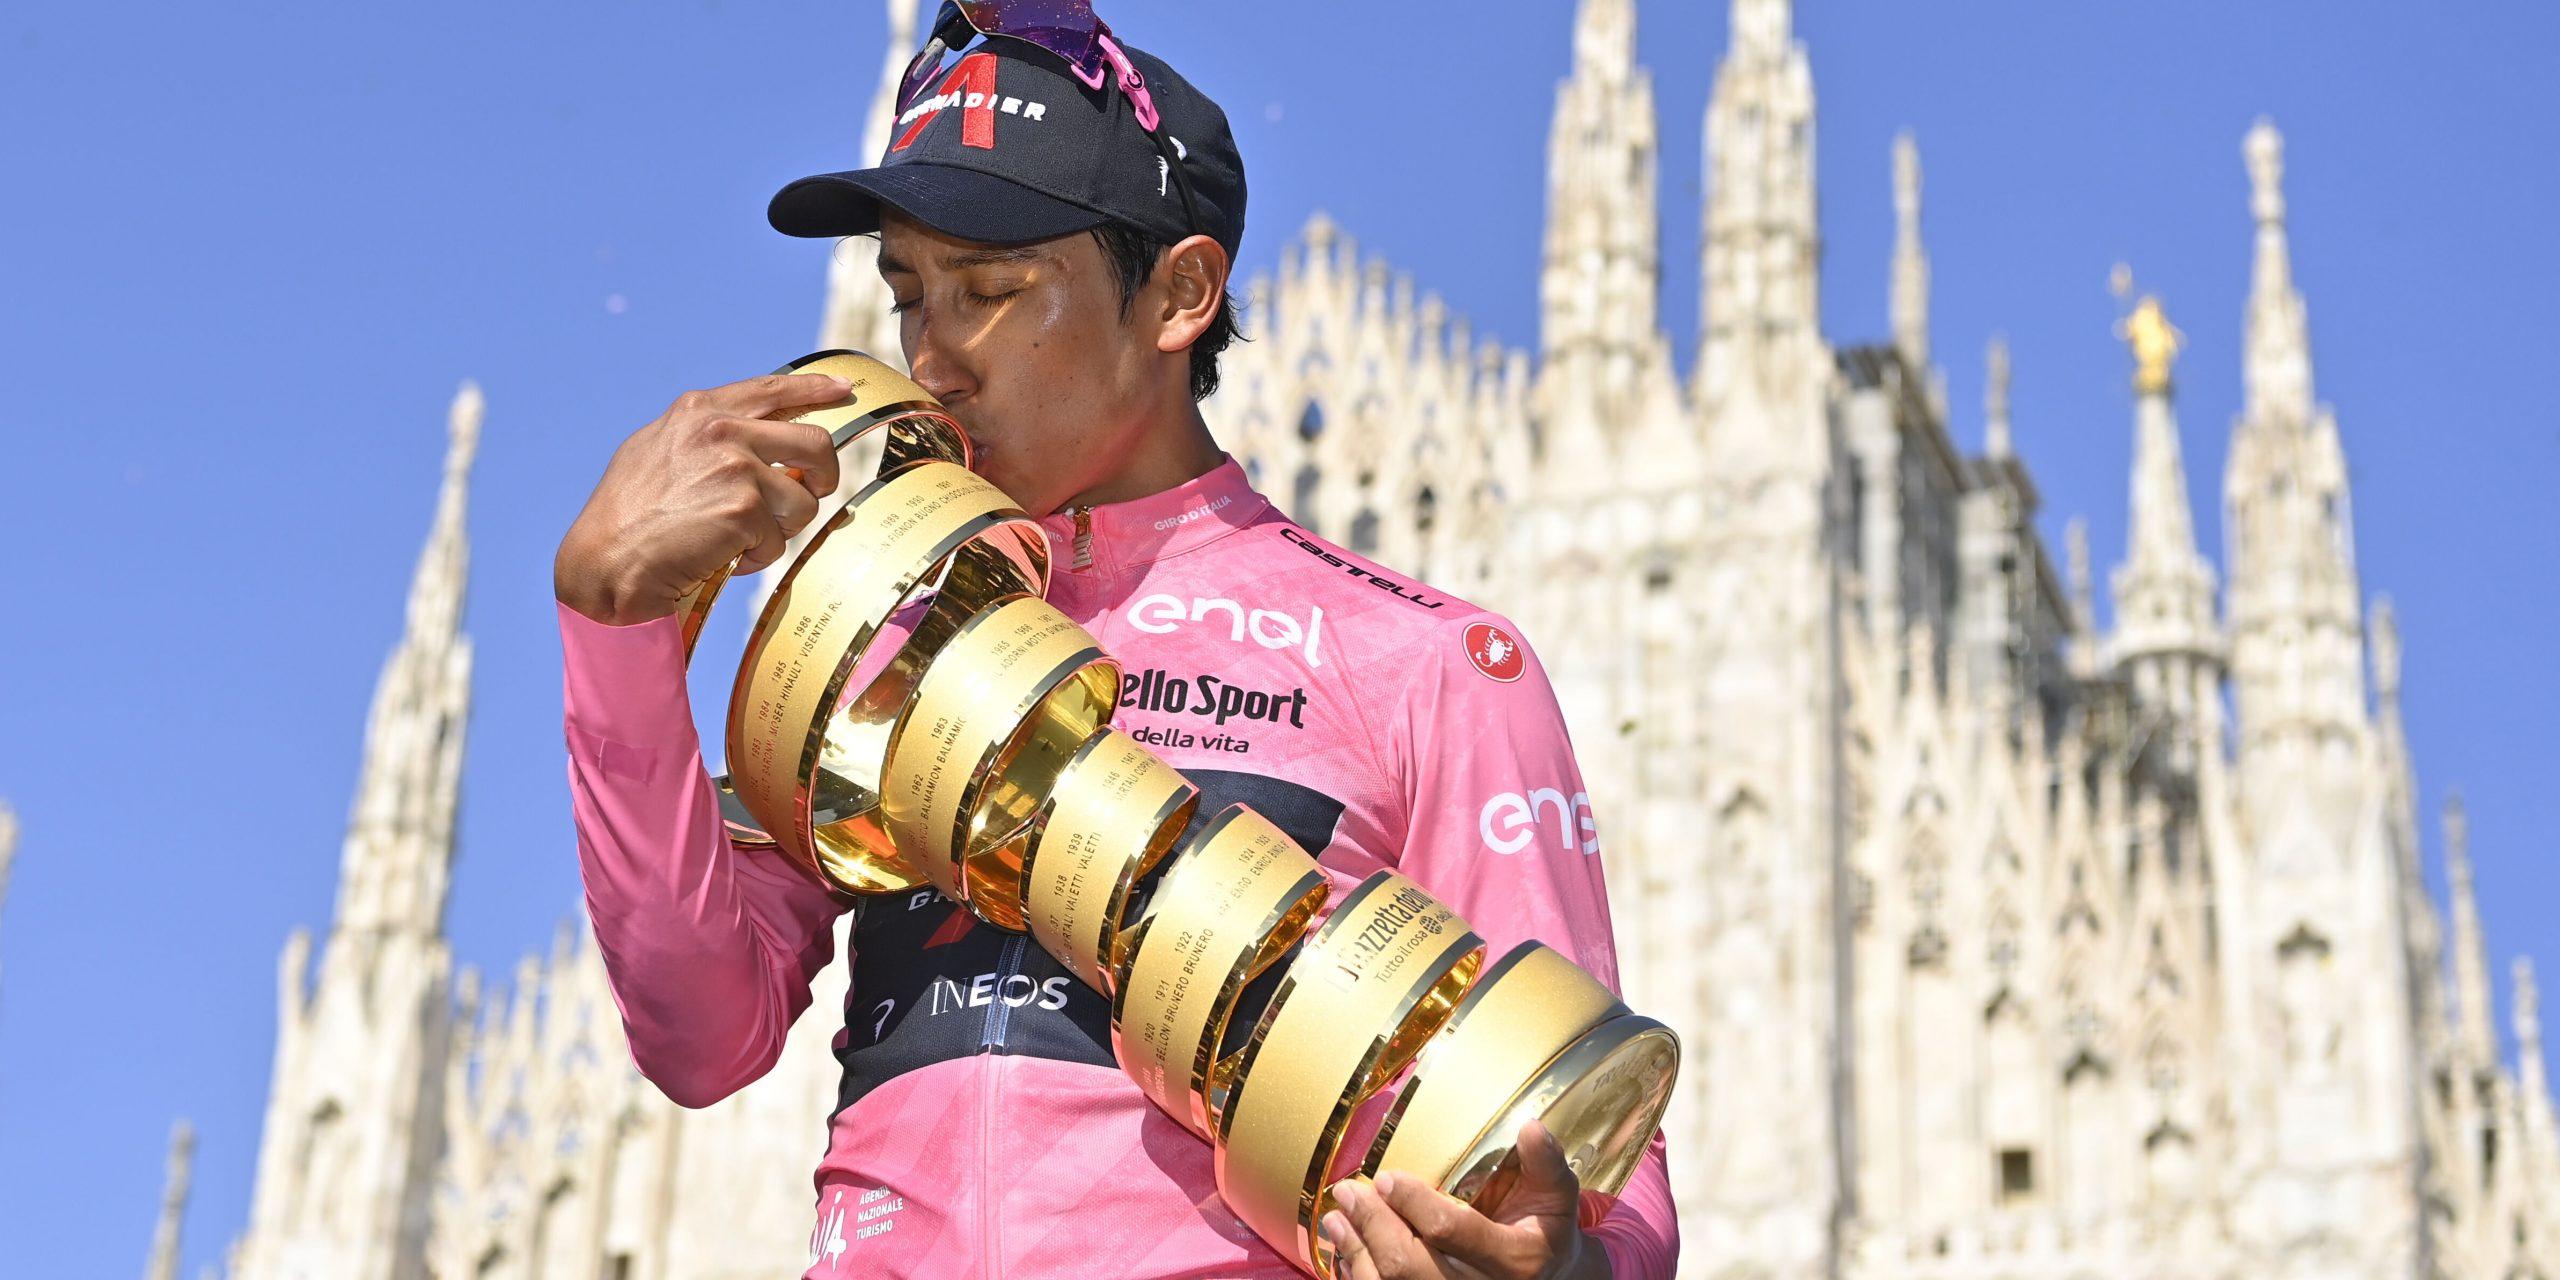 Giro d'Italia 2021 | Página Oficial del Giro de Italia